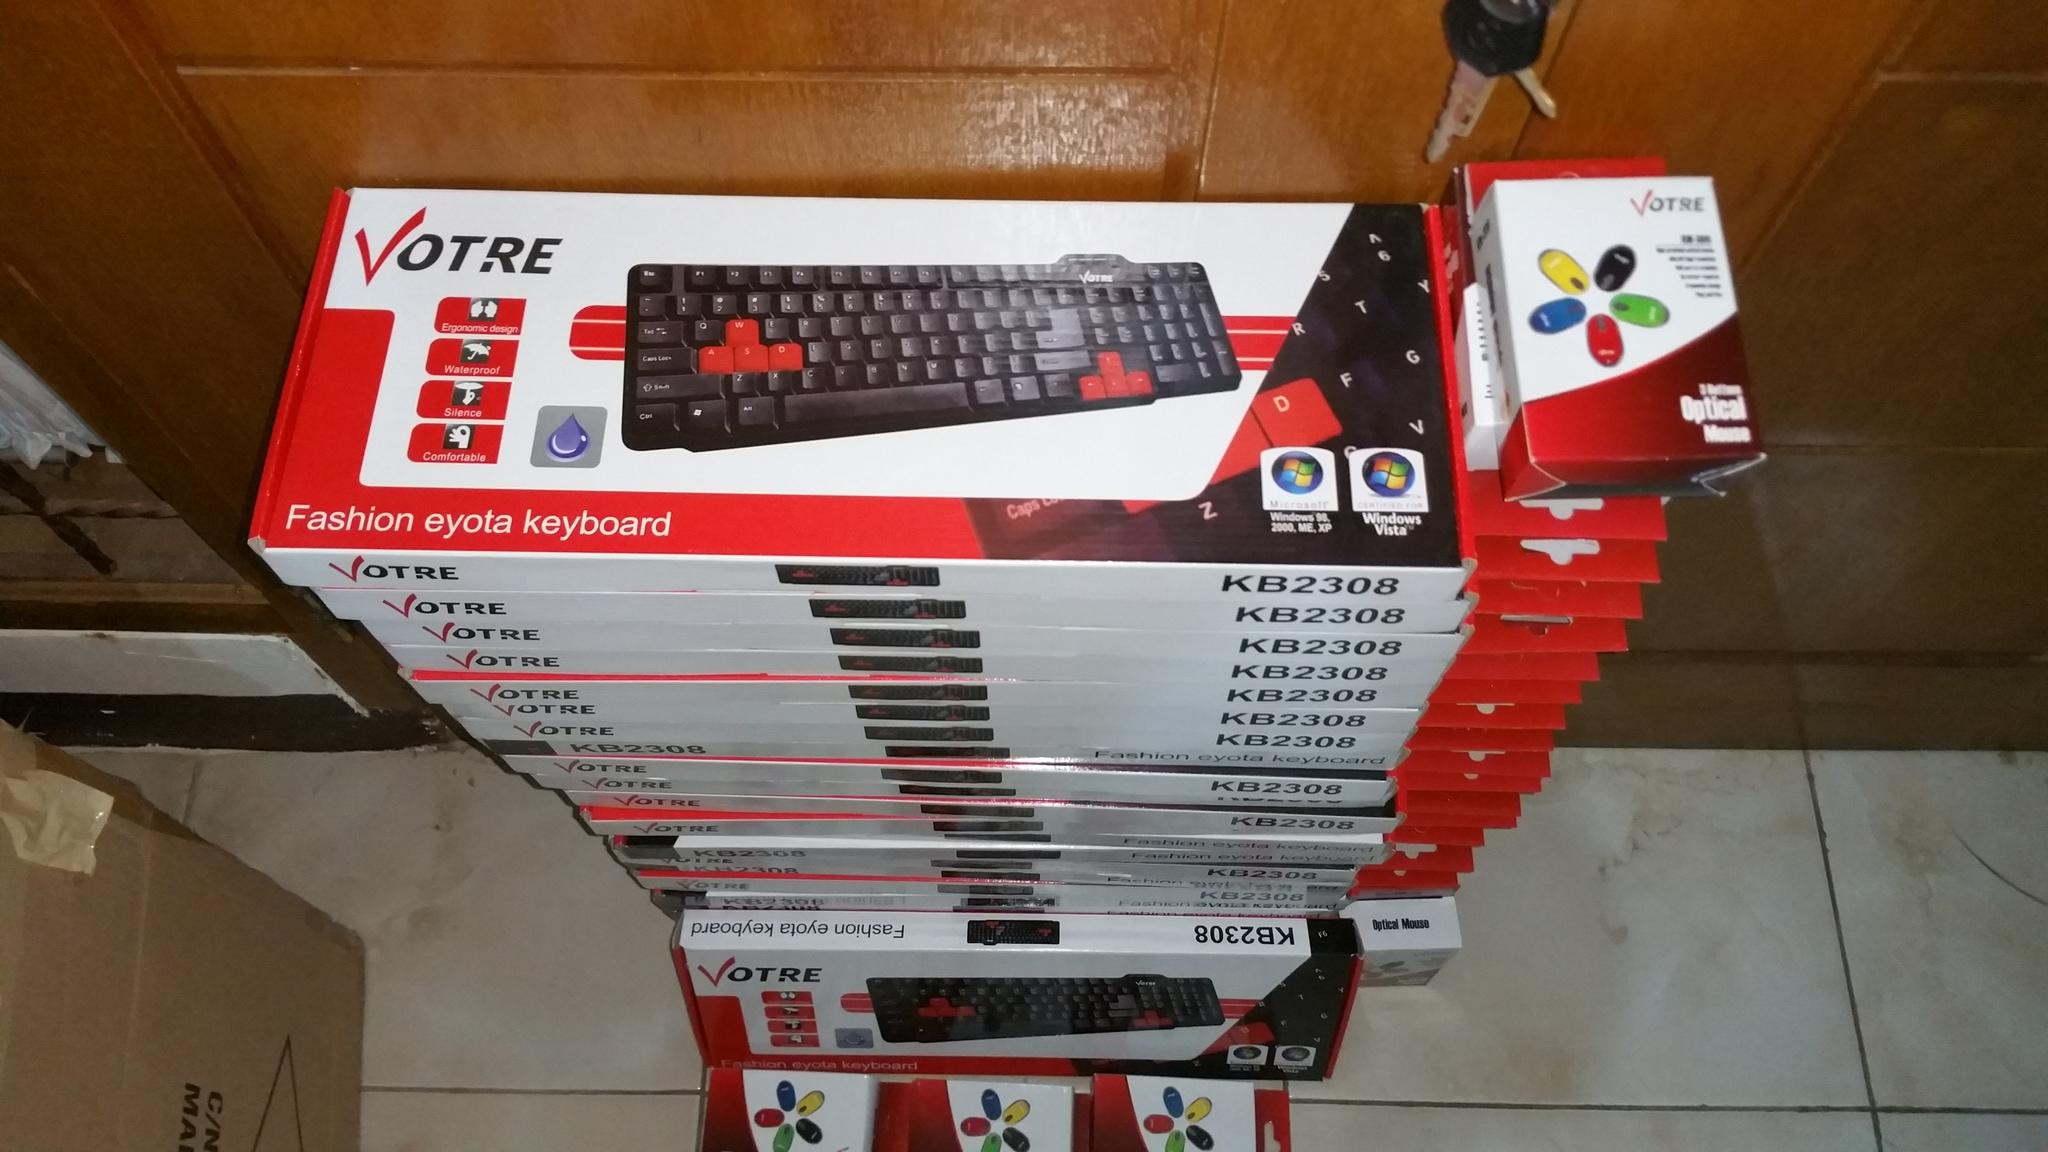 Jual Keyboard Dan Mouse Usb Optical Votre Paket Jaya Plaza Kb2308 Tokopedia